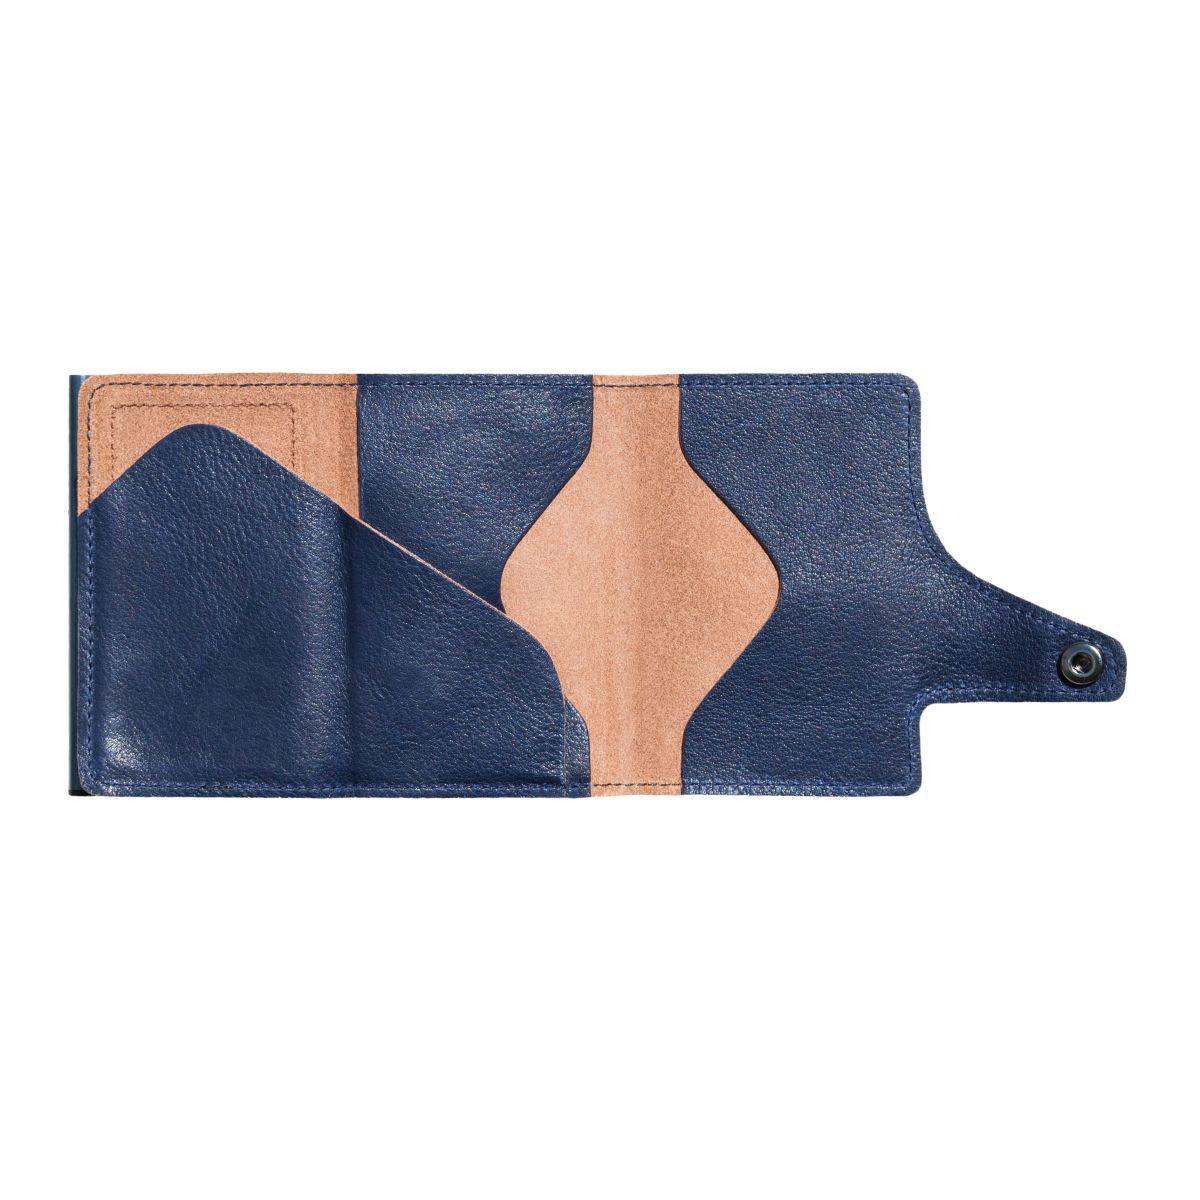 TRU VIRTU Click n Slide Wallet - Caramba Blue / Titan